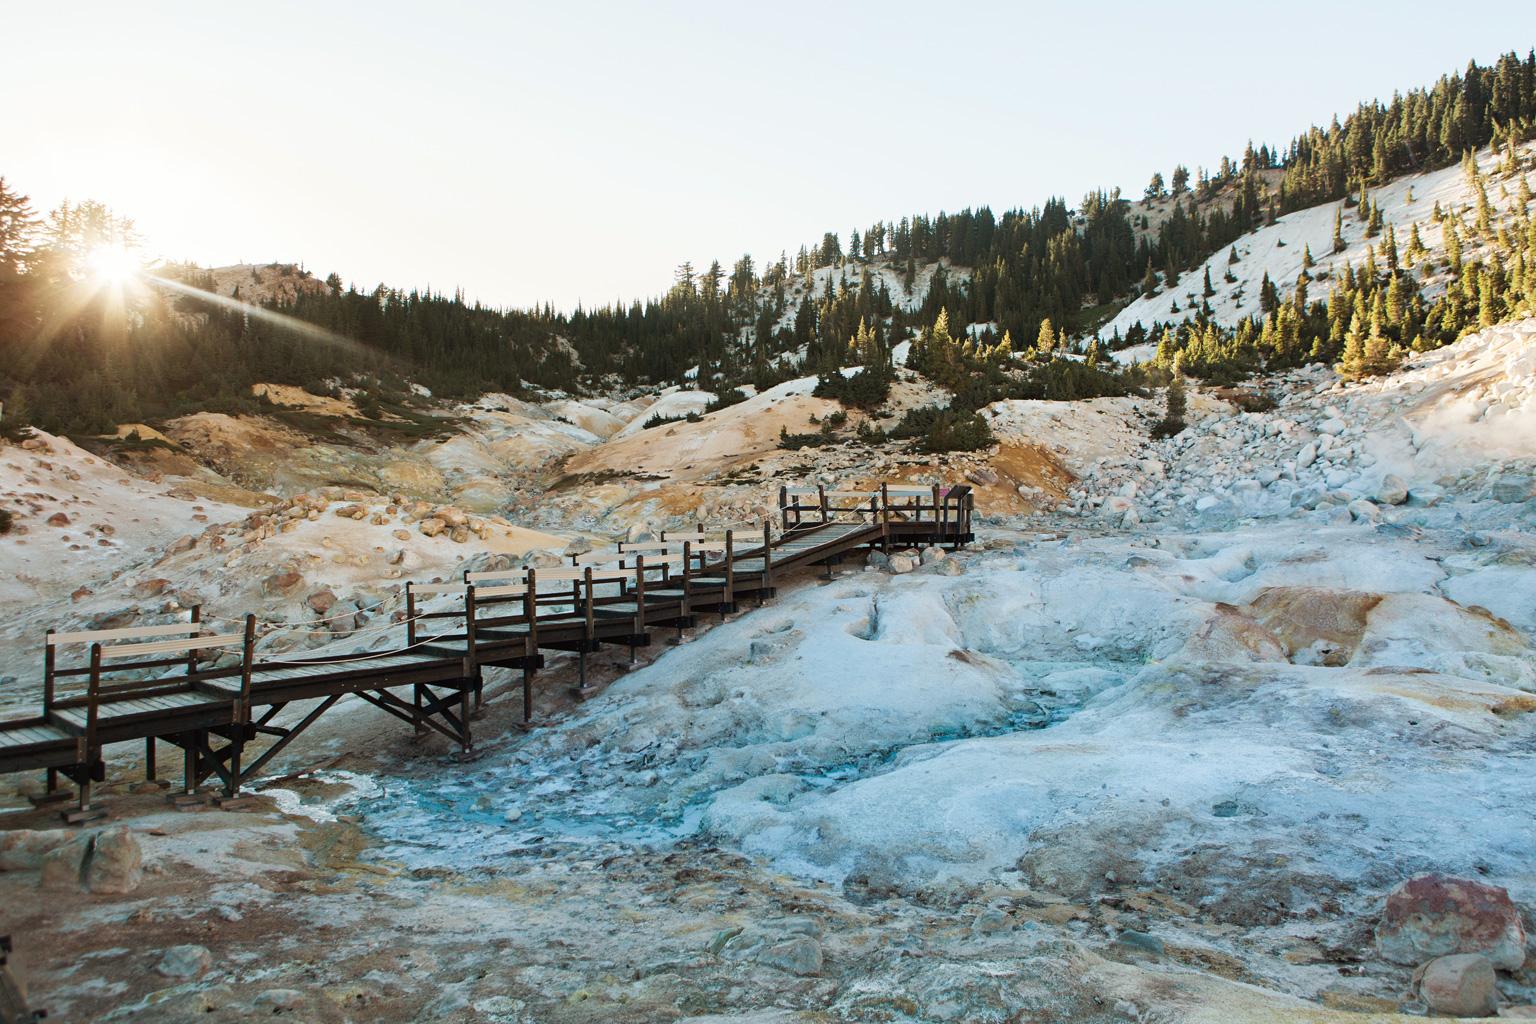 CindyGiovagnoli_Lassen_Volcanic_National_Park_California_camp_road_trip-007.jpg